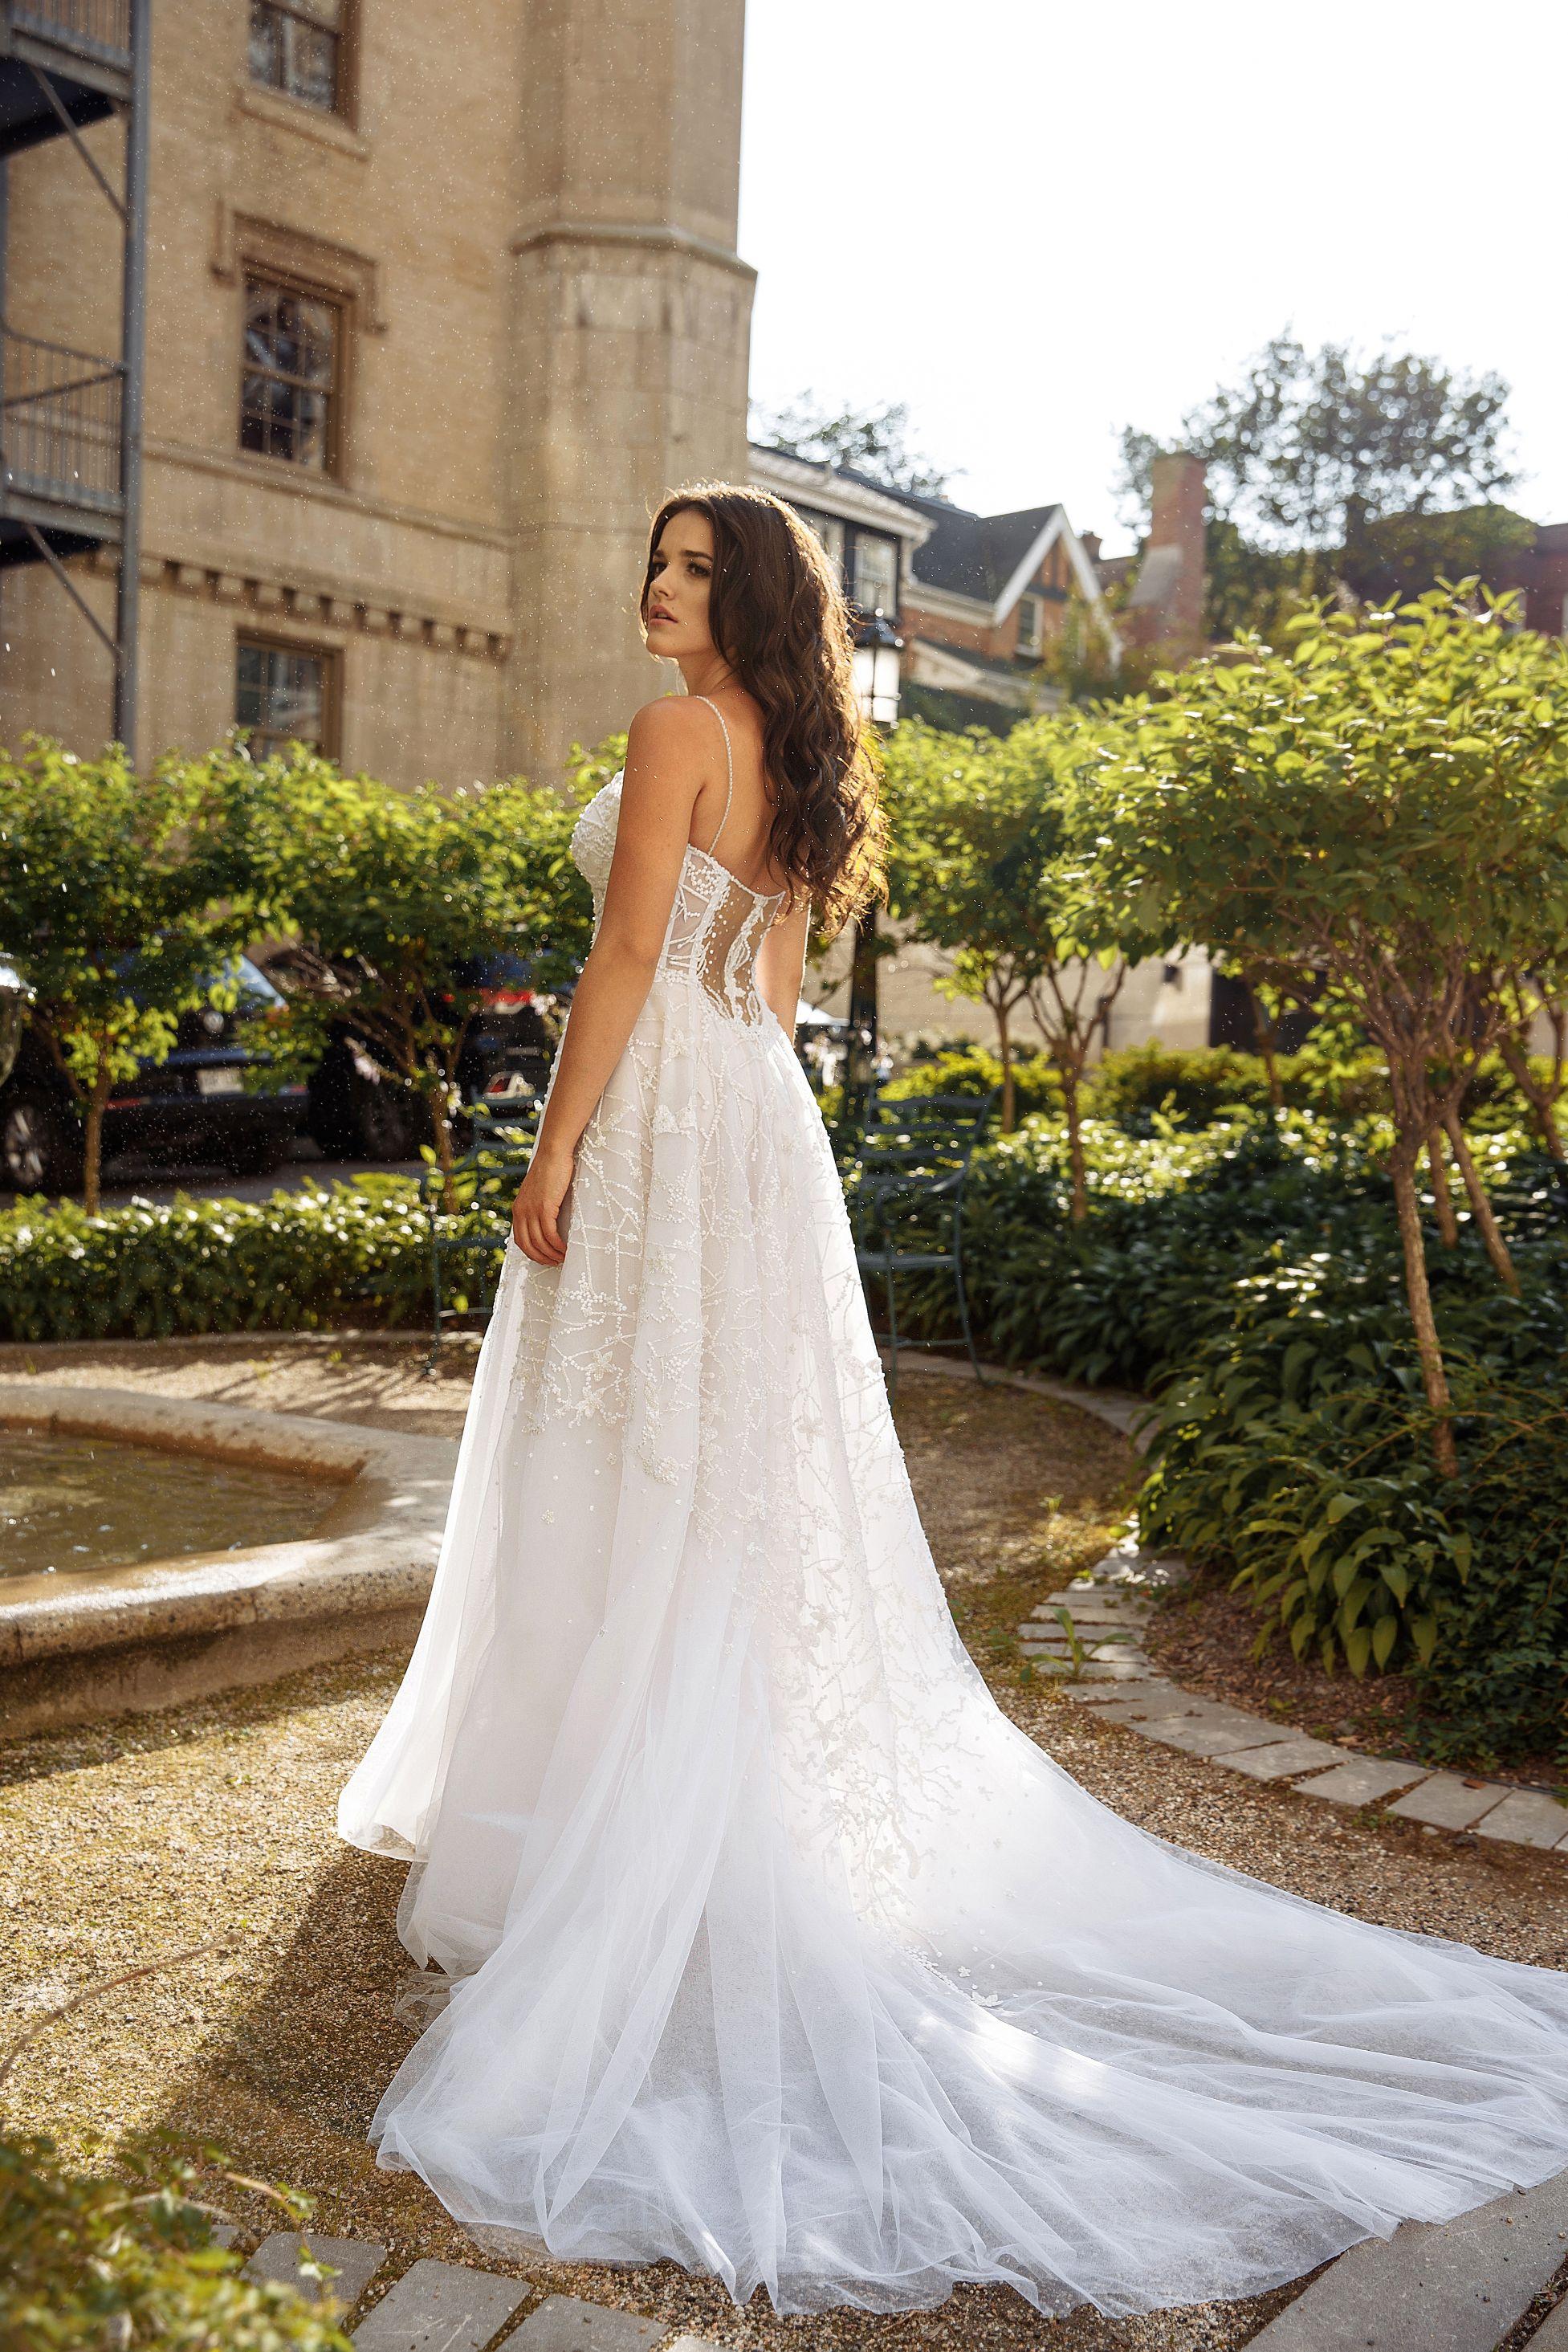 robe de mariee brillante ligne-a en tulle lilia haute couture boutique robes de mariee luxueuse montreal